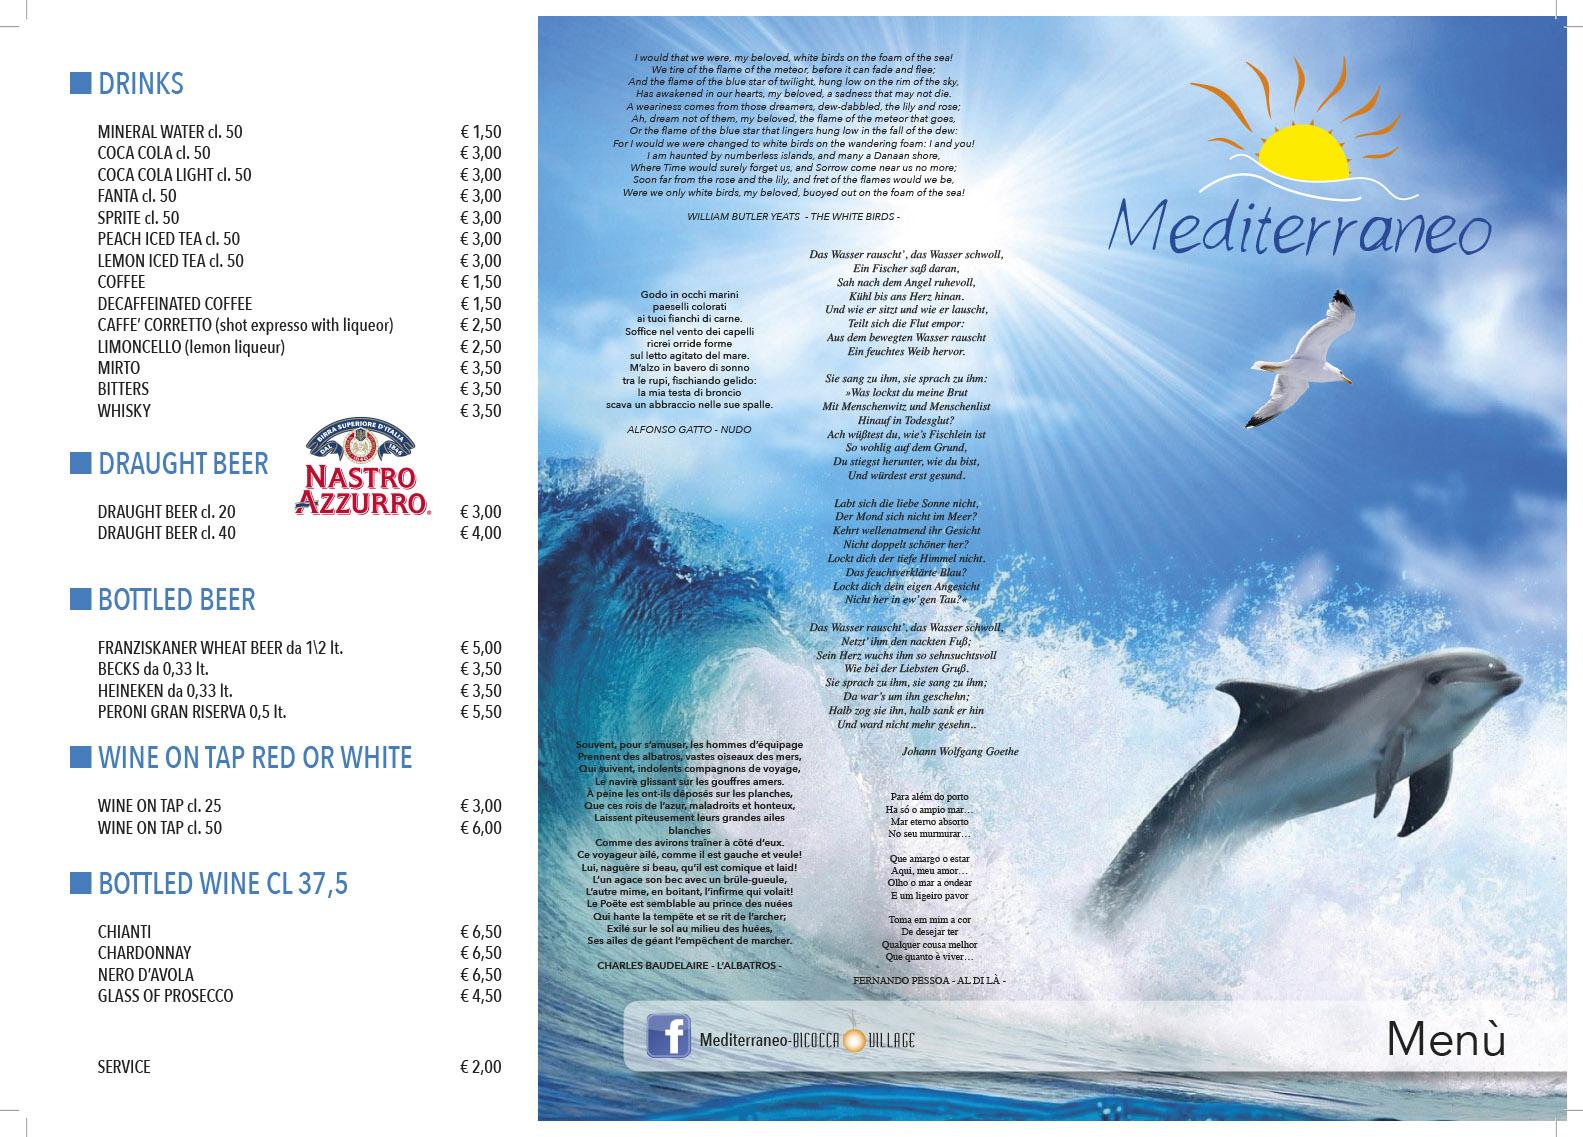 menu mediterraneo 2016 inglese